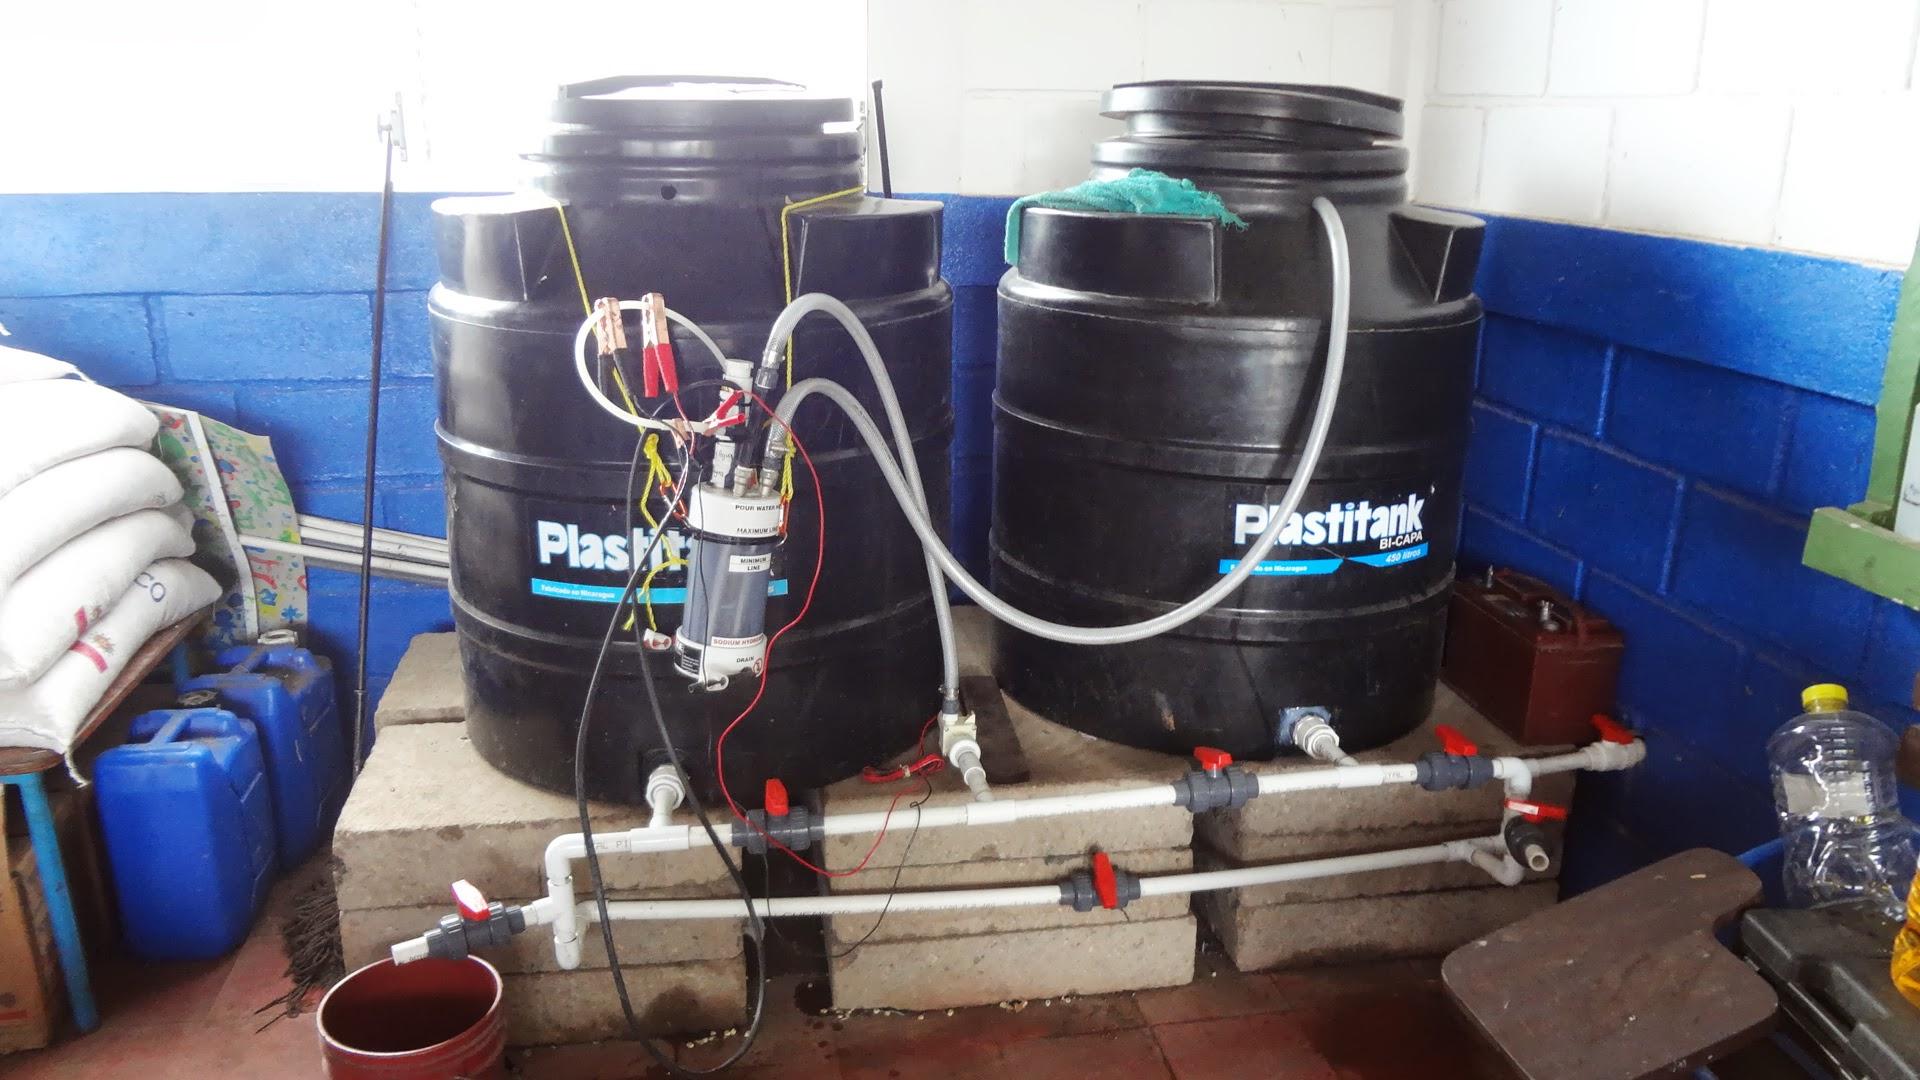 New manifold for circulating water